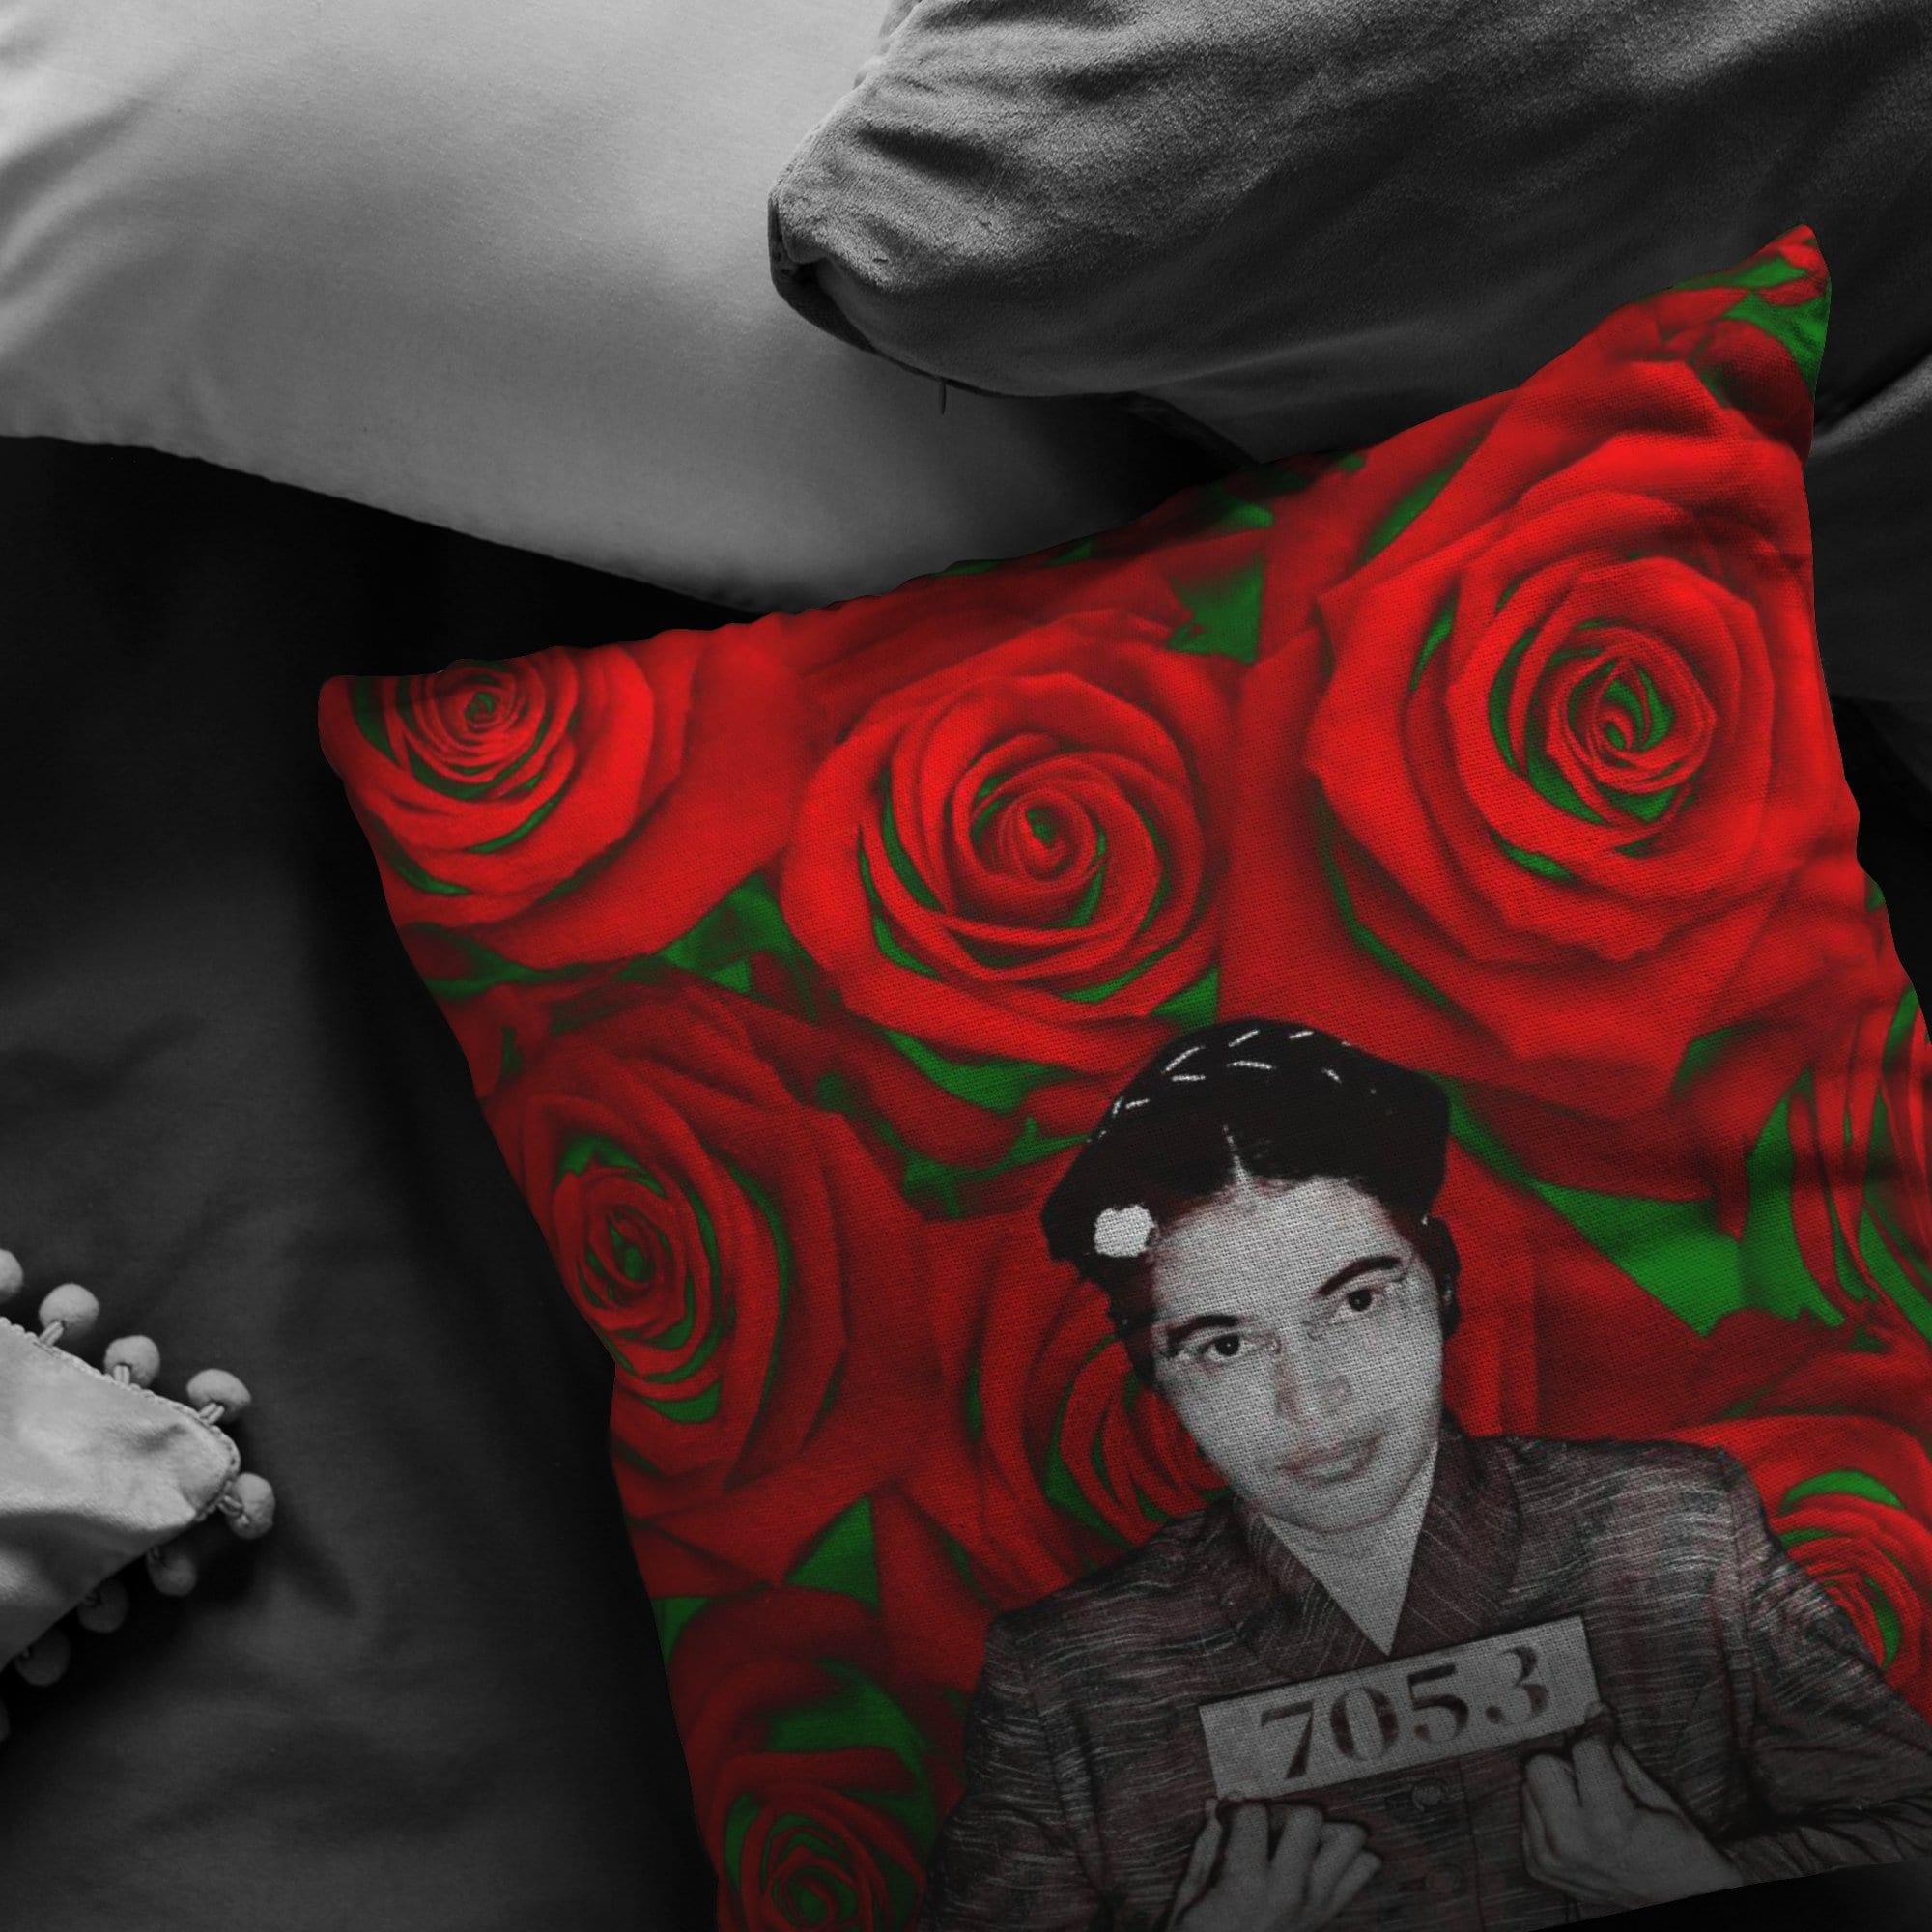 ROSA PARKS 7053 Pillow - Melanin Apparel